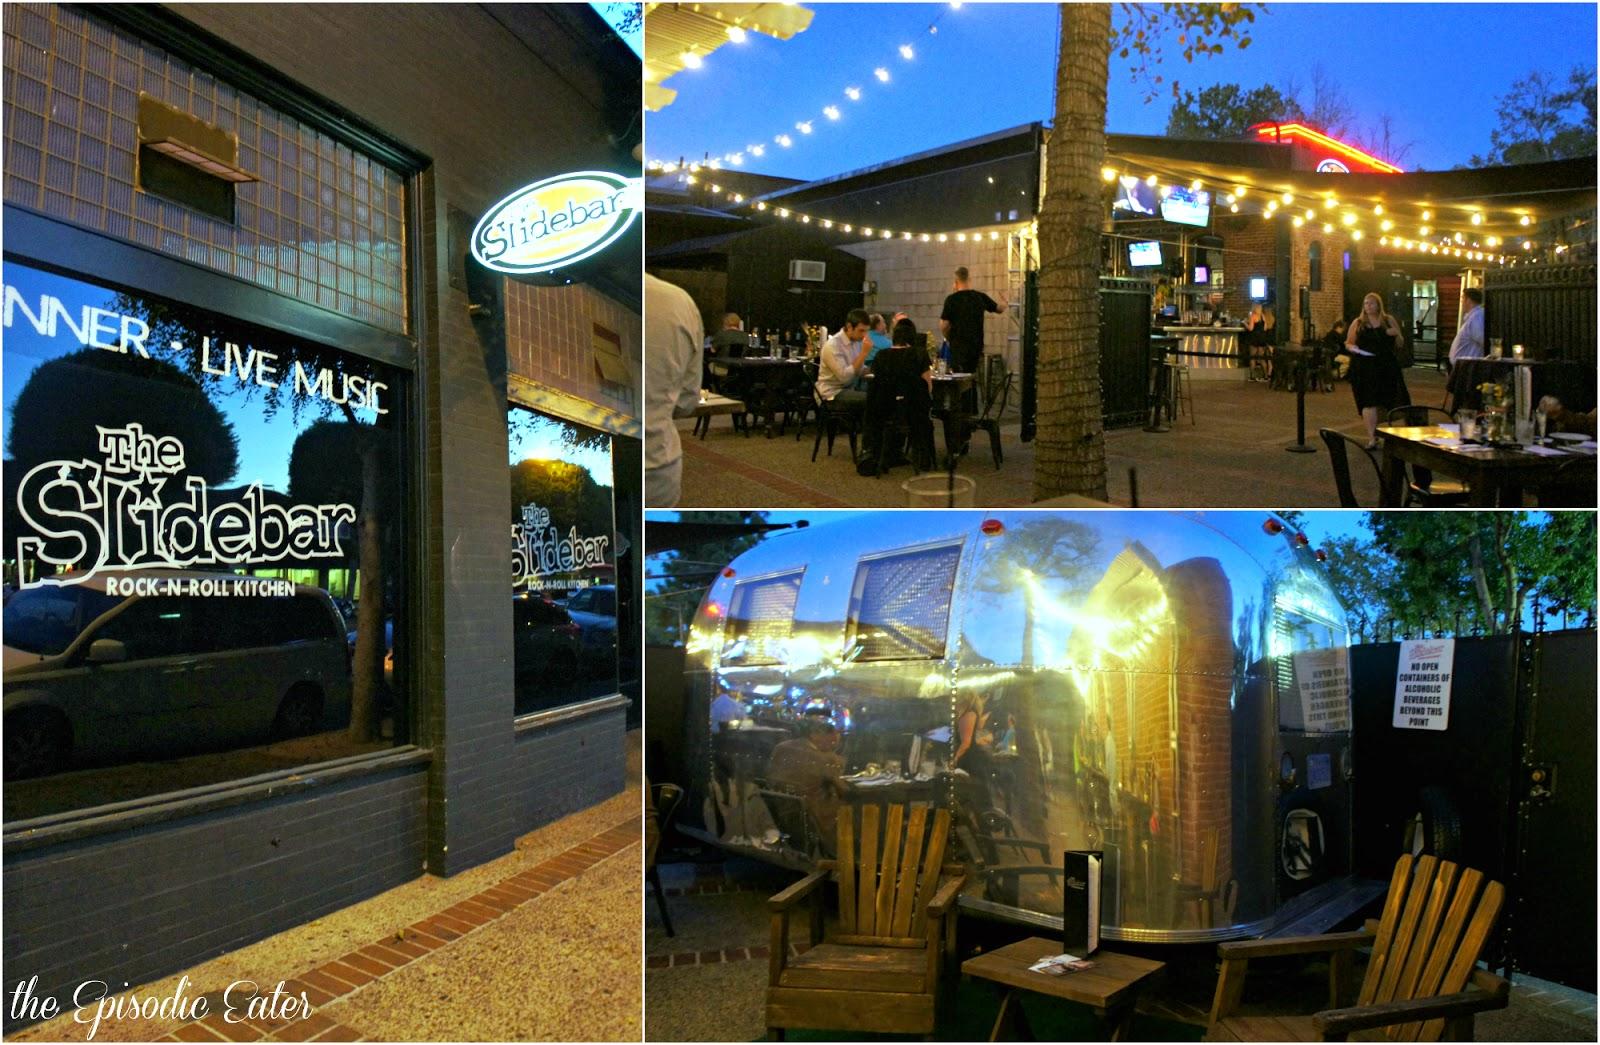 The Slidebar Rock-N-Roll Kitchen (Fullerton, CA) on The Episodic Eater